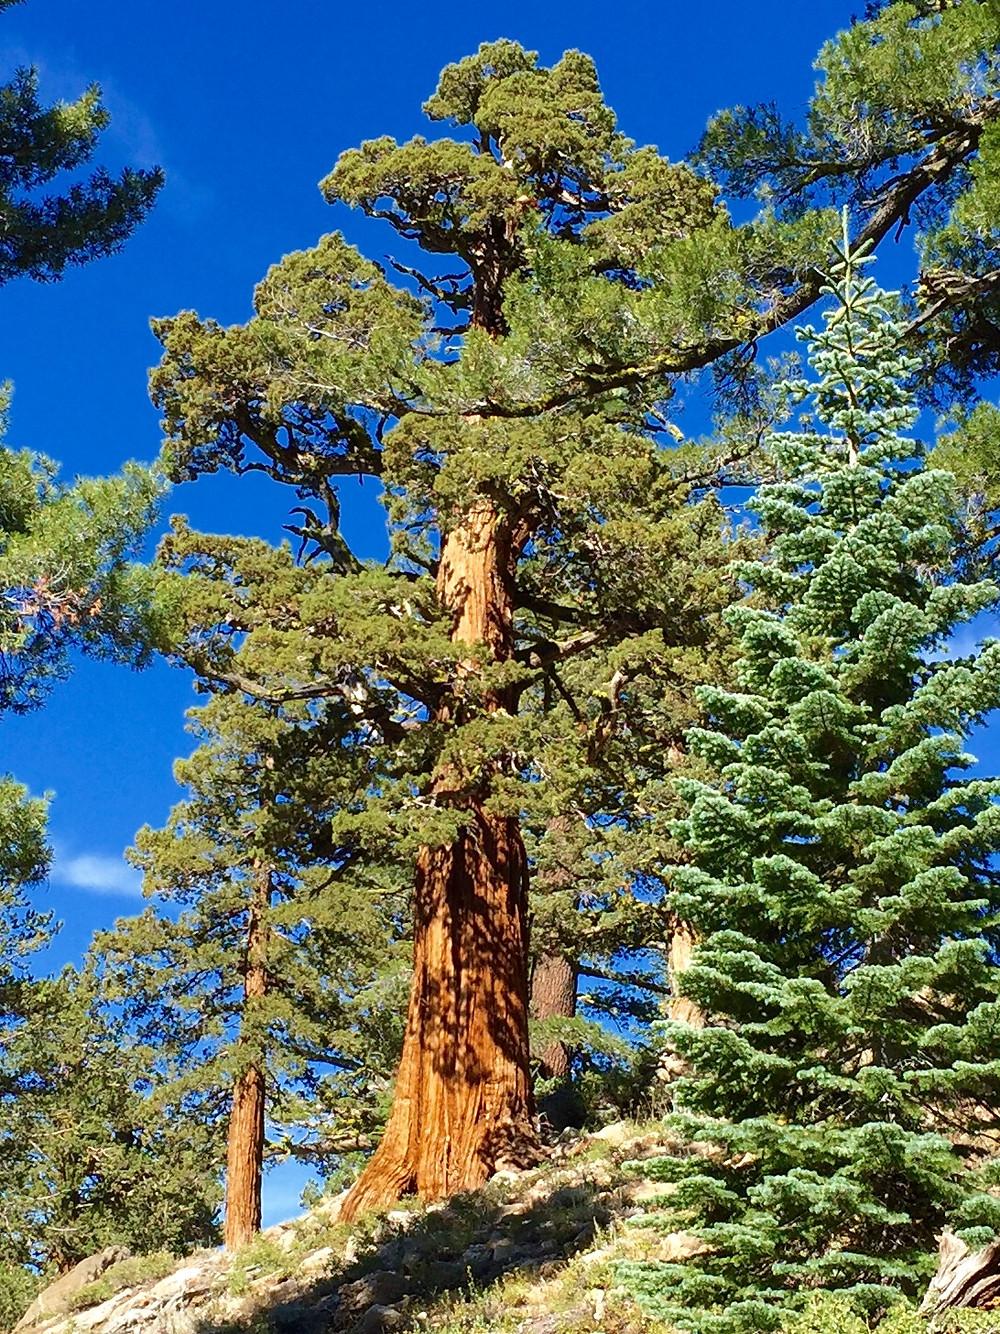 Majestic Ancient Tree